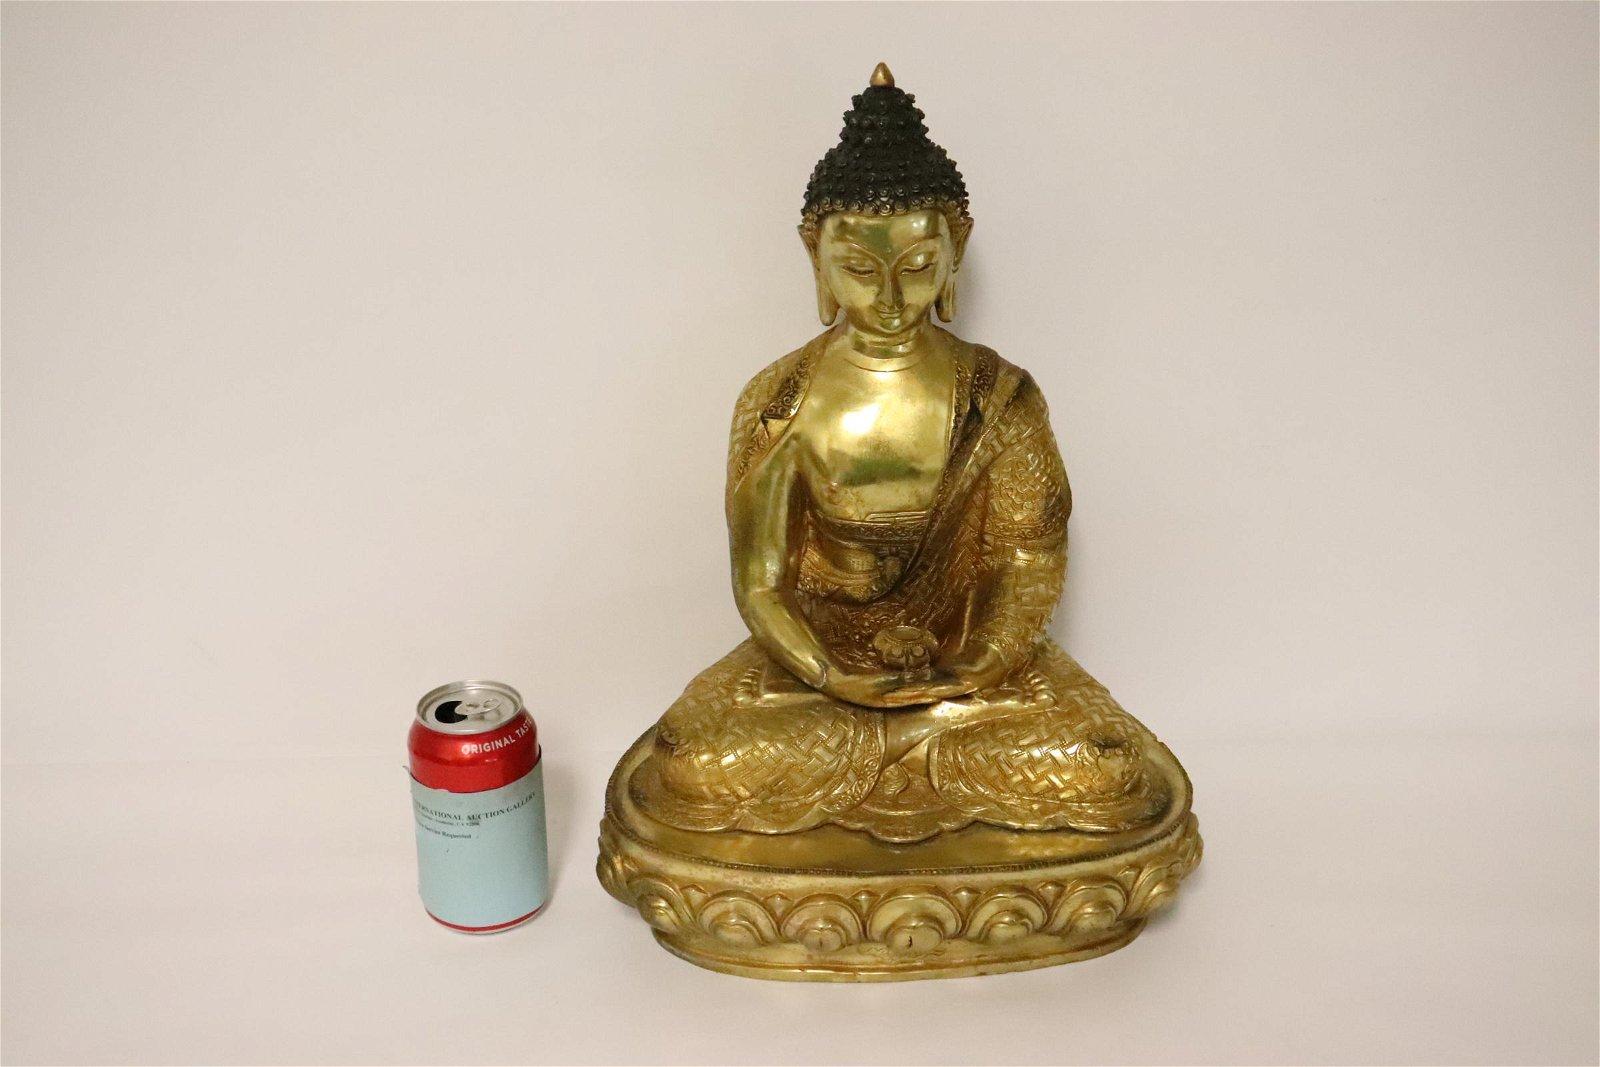 A beautiful Chinese gilt bronze sculpture of deity